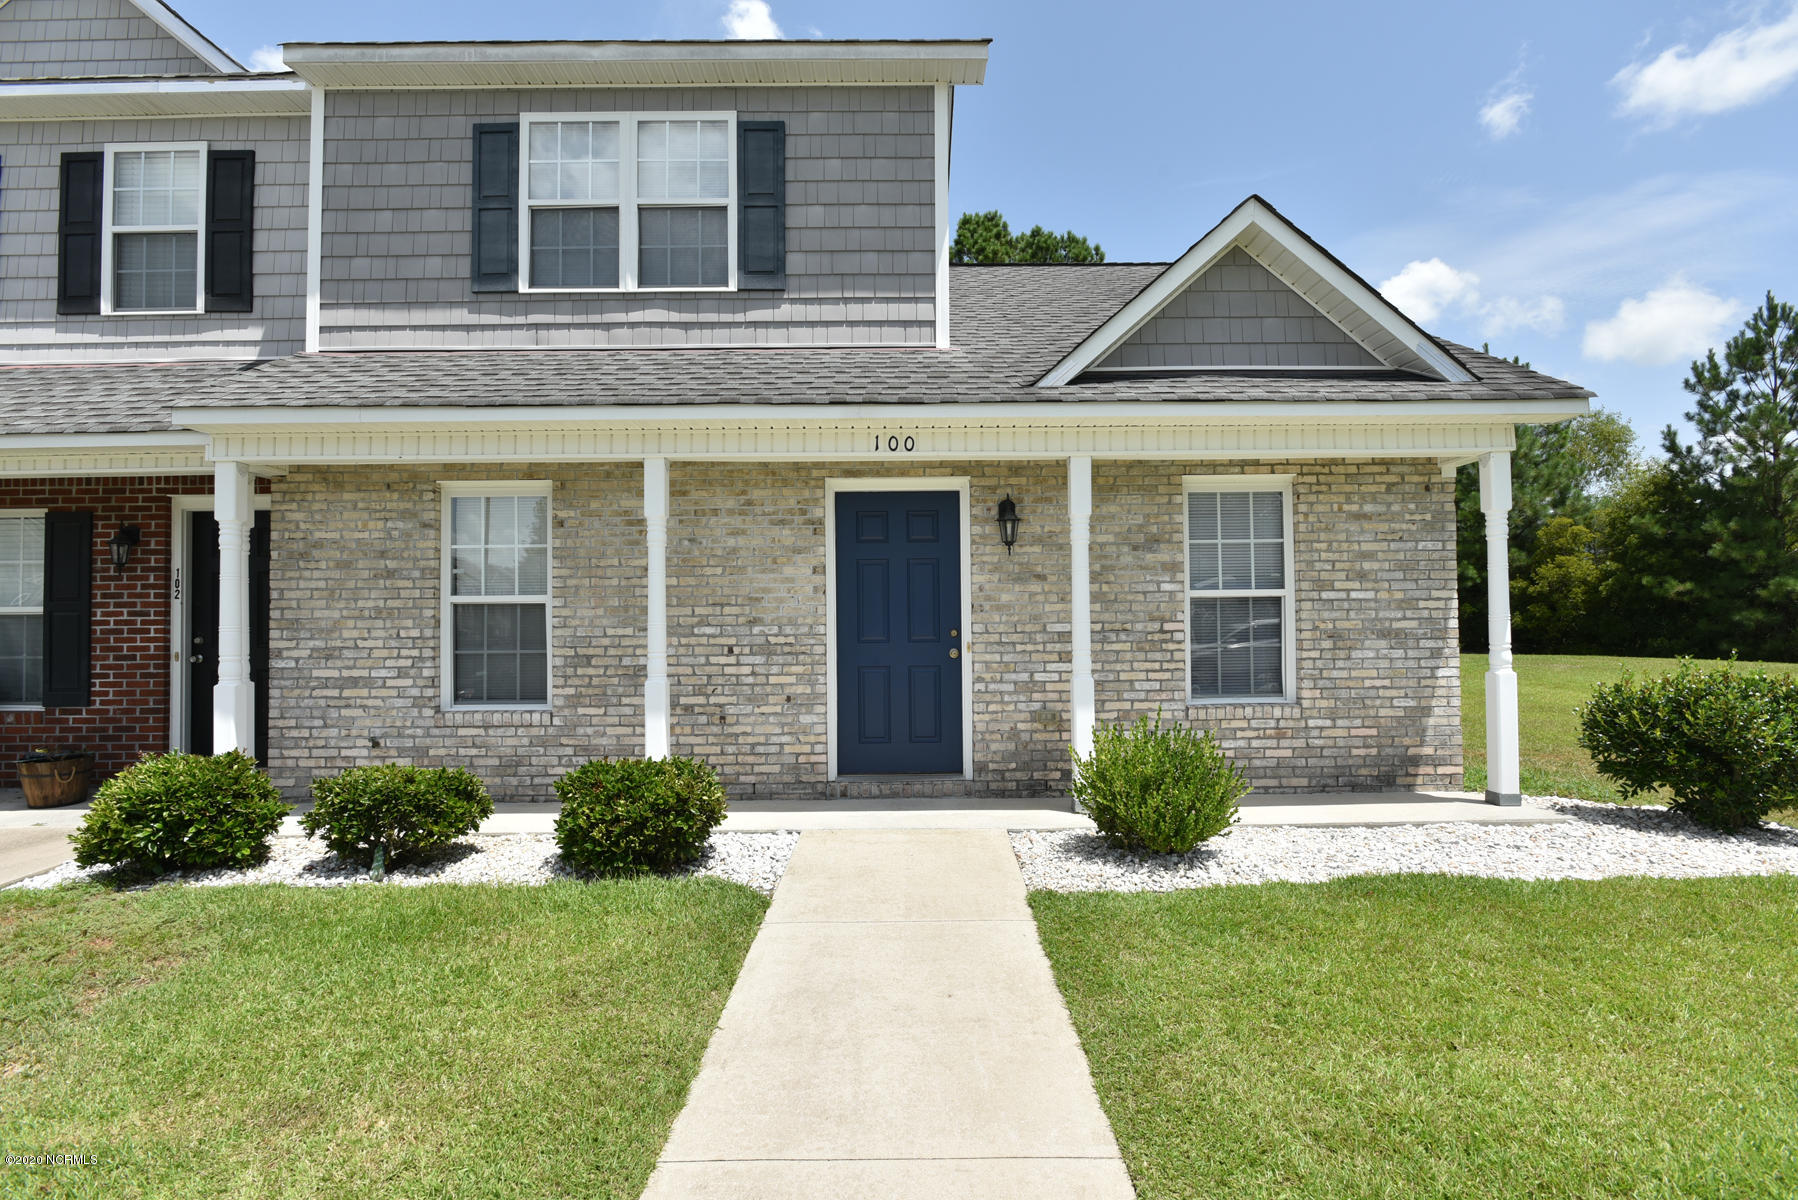 100 Springwood Drive, Jacksonville, North Carolina 28546, 3 Bedrooms Bedrooms, ,3 BathroomsBathrooms,Residential,For Sale,Springwood,100230026